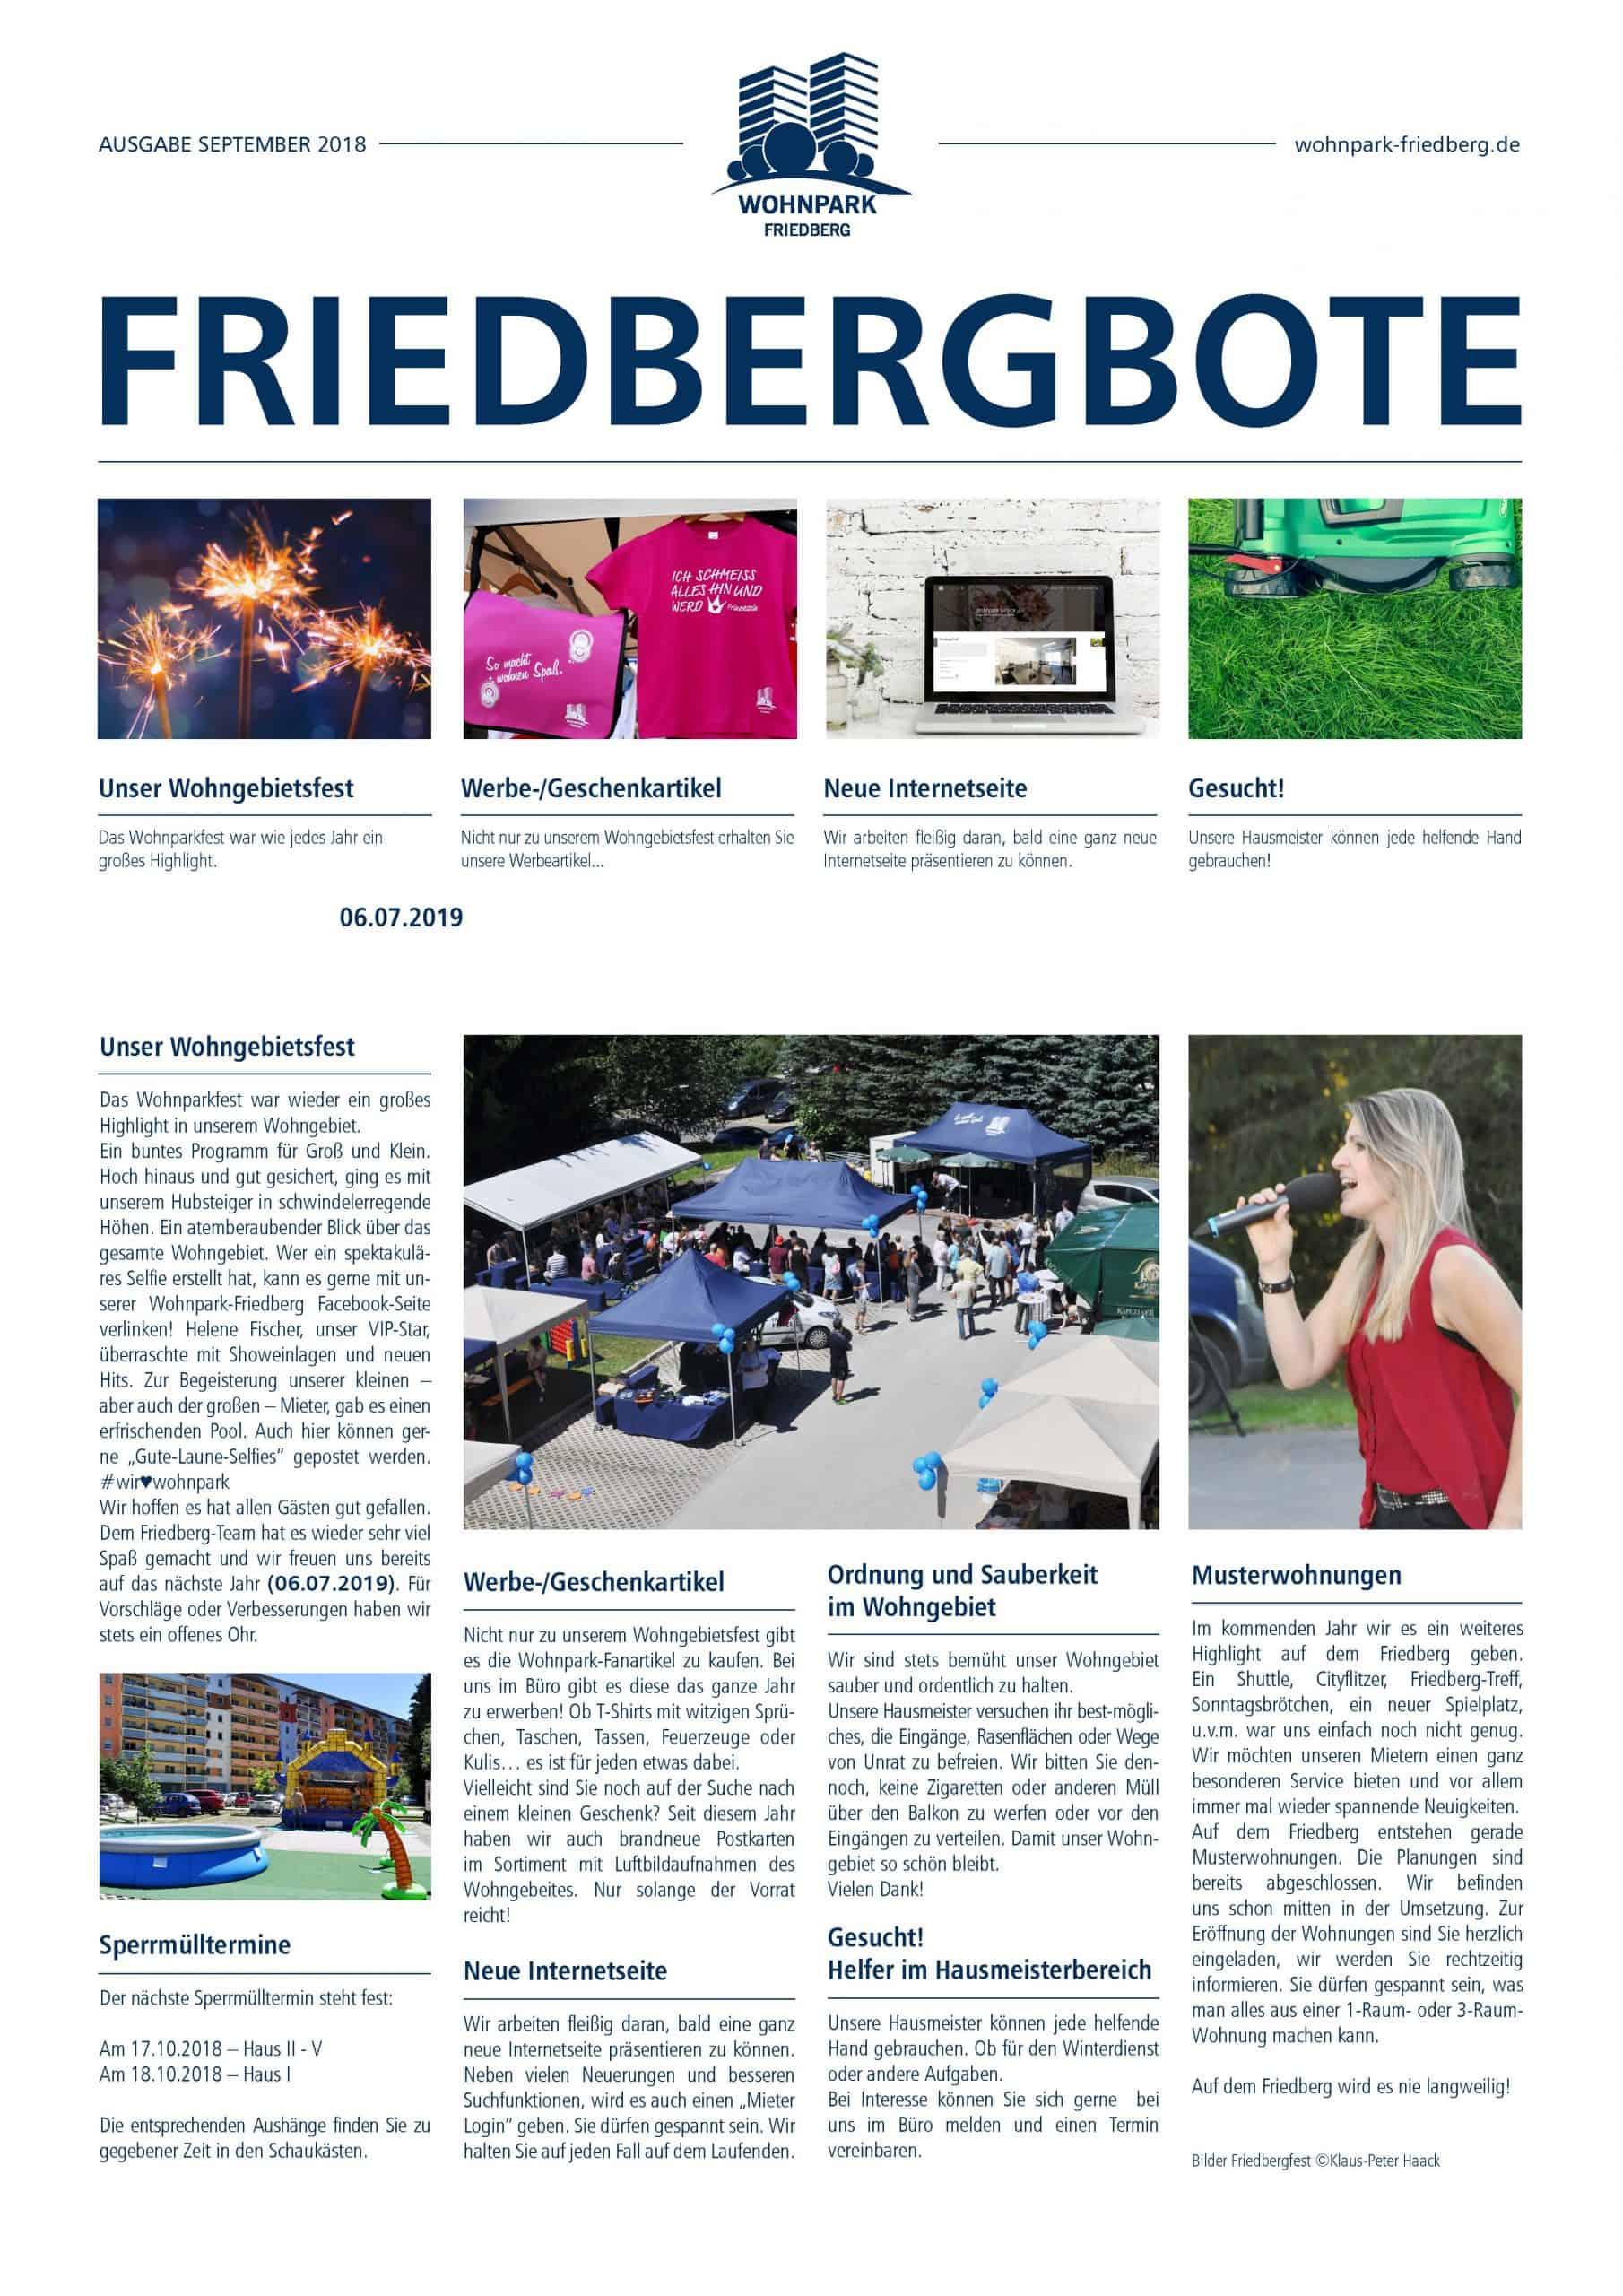 Friedbergbote – September 2018